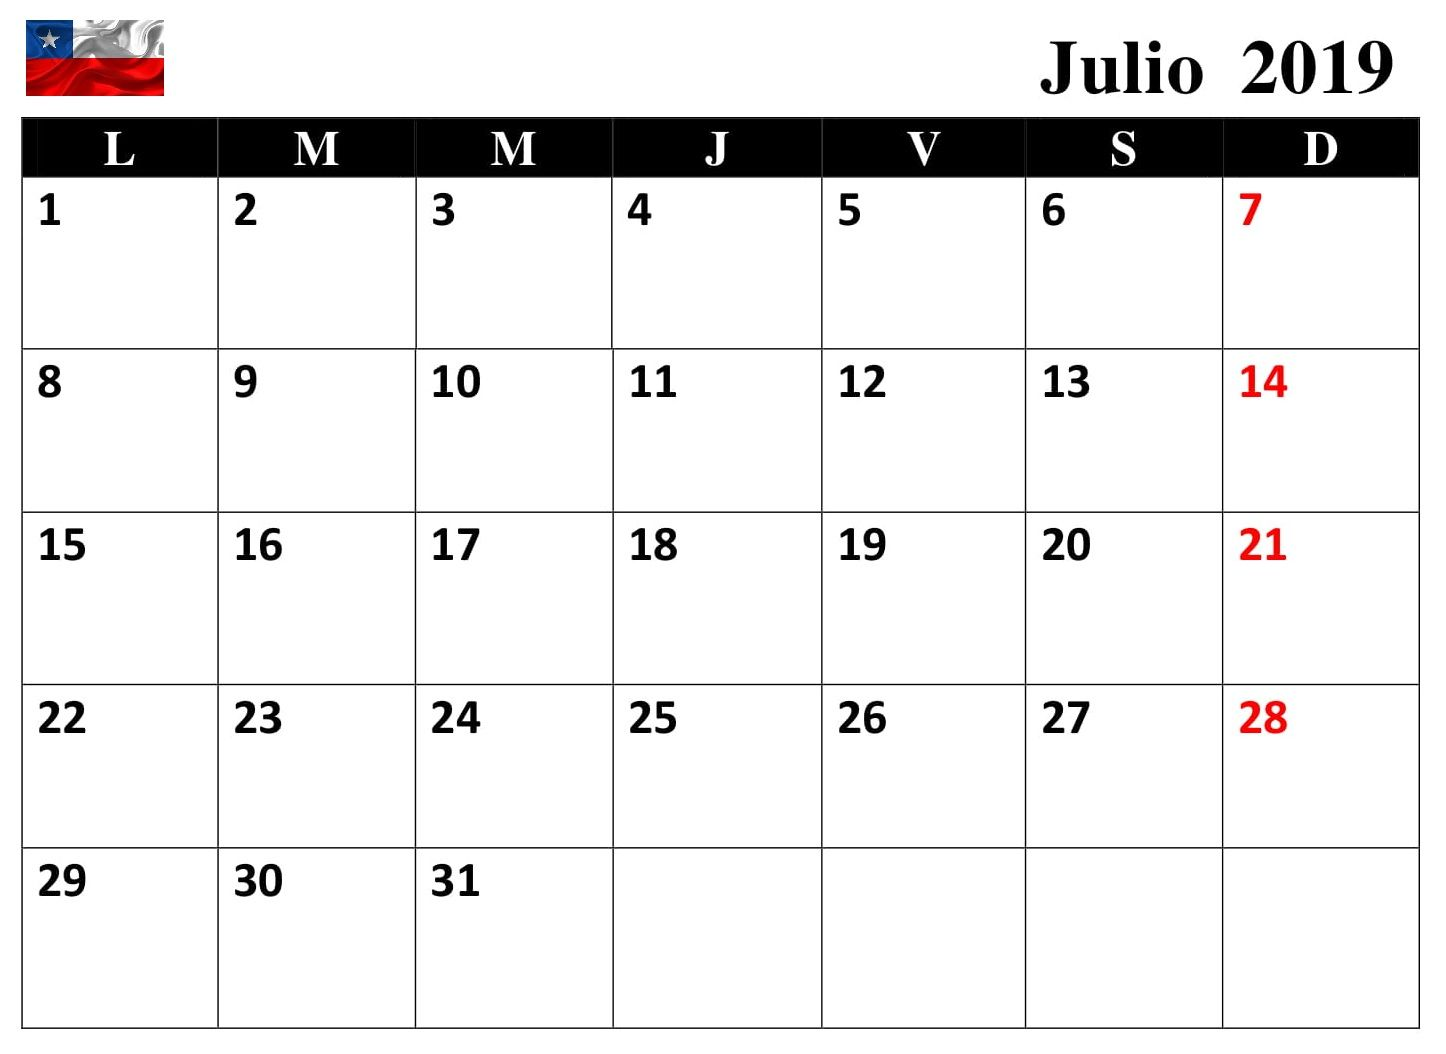 Calendario 2019 Julio Chile.Calendario Mensual Julio 2019 Chile Calendario Julio 2019